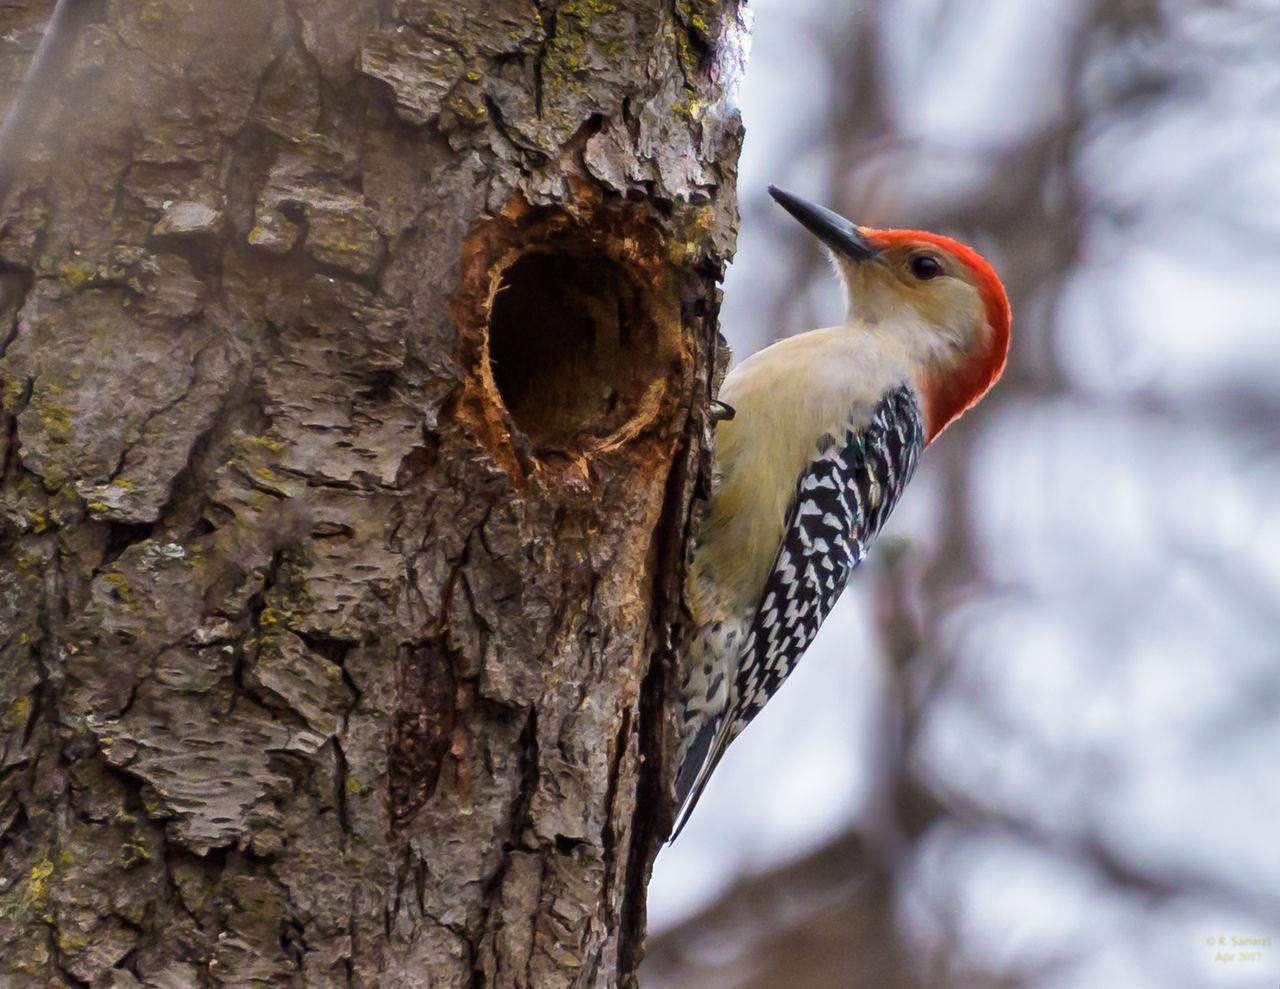 Red Bellied Woodpecker Animal, Bird Nature Outdoors Red Bellied Woodpecker Eating Tree Wild Wildlife Woodpecker Woodpecker In Tree